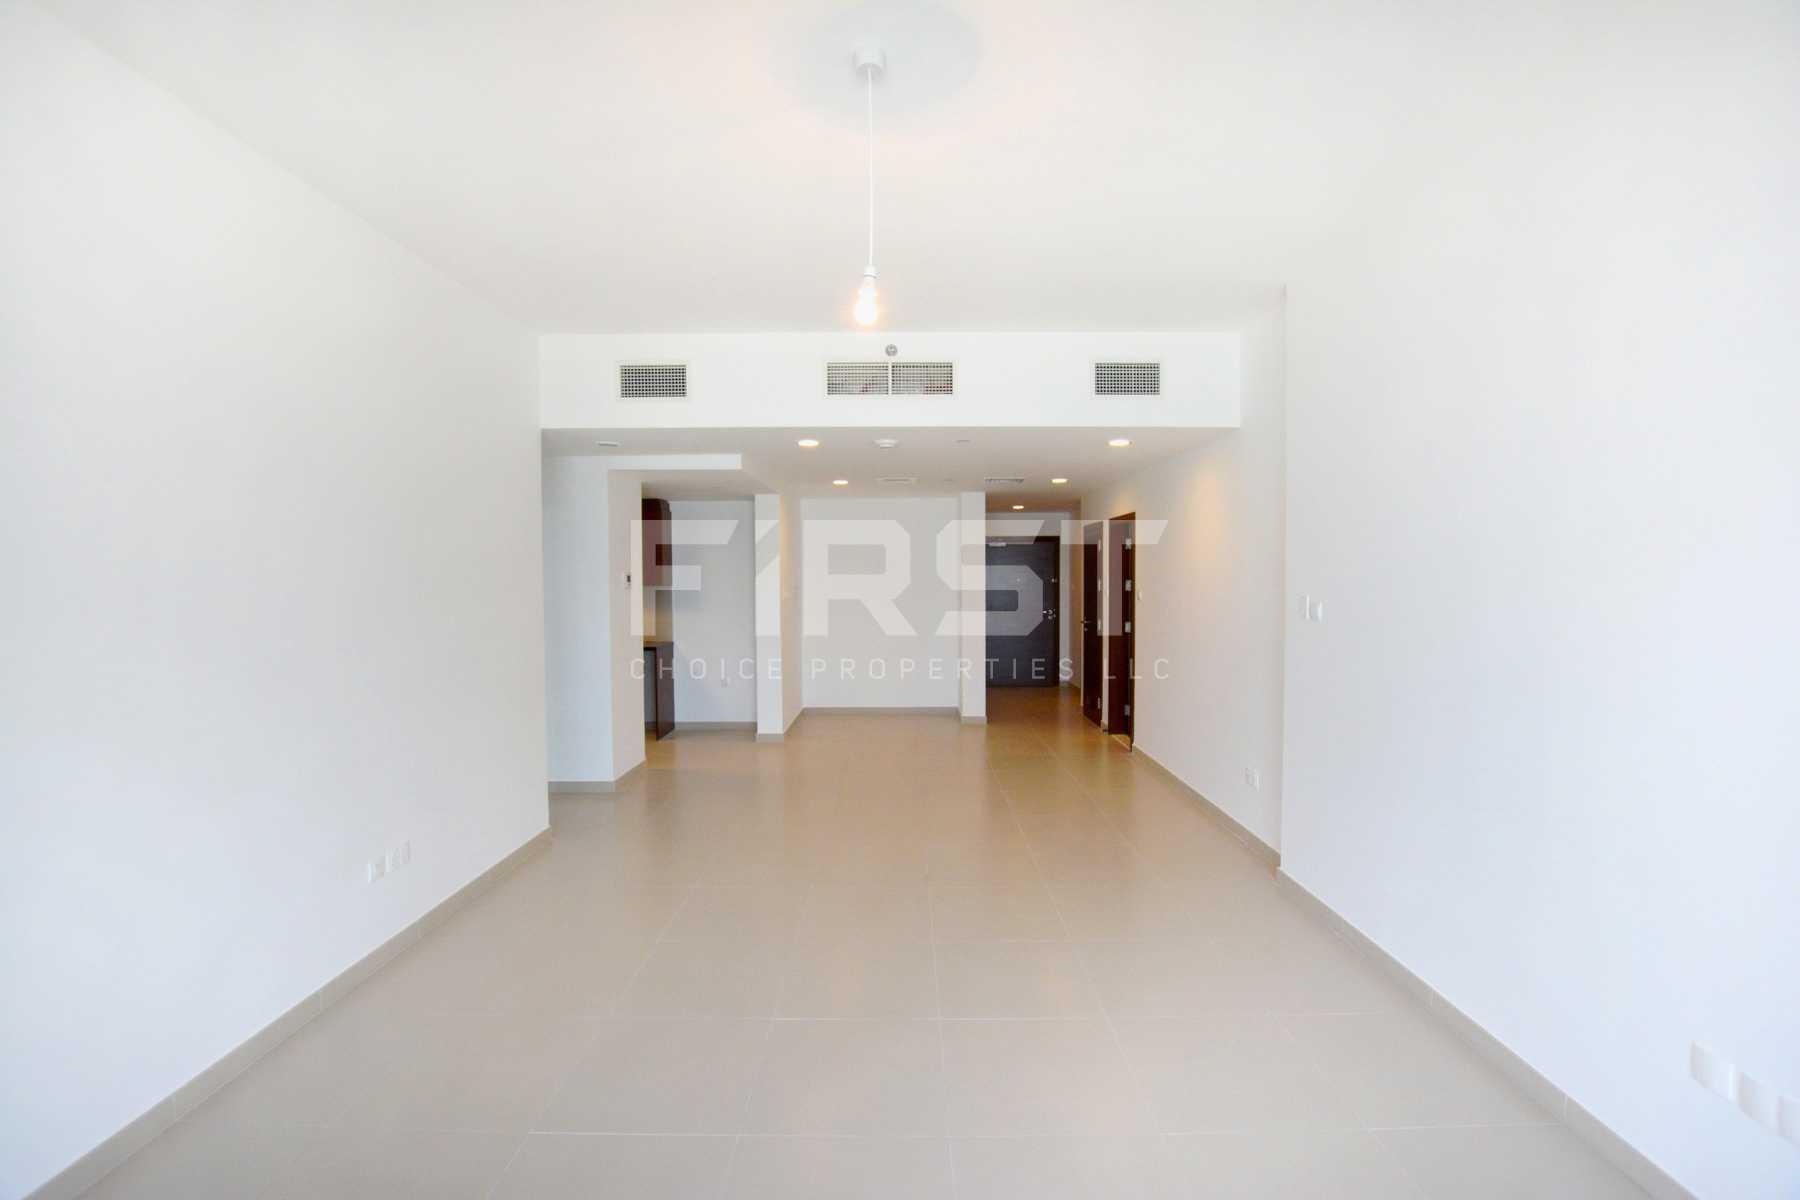 Internal Photo of 3 Bedroom Apartment in The Gate Tower Shams Abu Dhabi Al Reem Island Abu Dhabi UAE (2).jpg